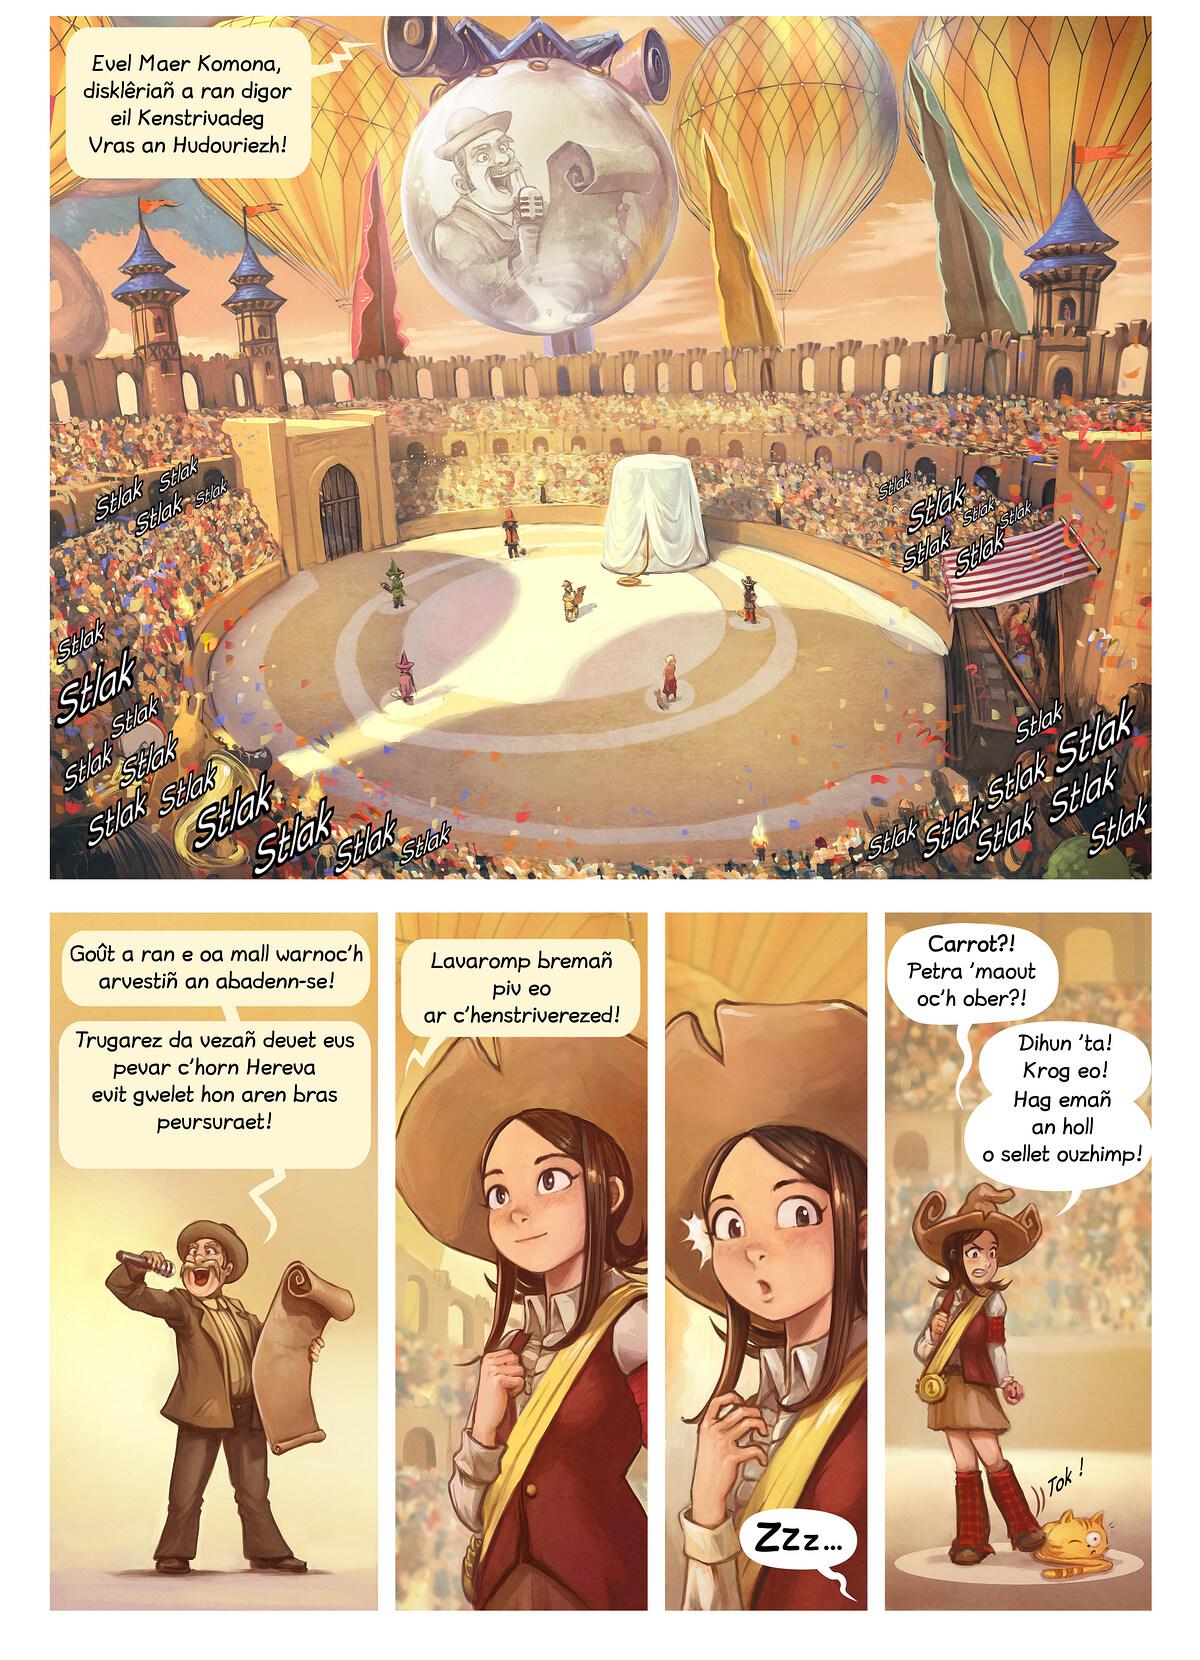 Rann 21: Ar genstrivadeg hudouriezh, Page 3